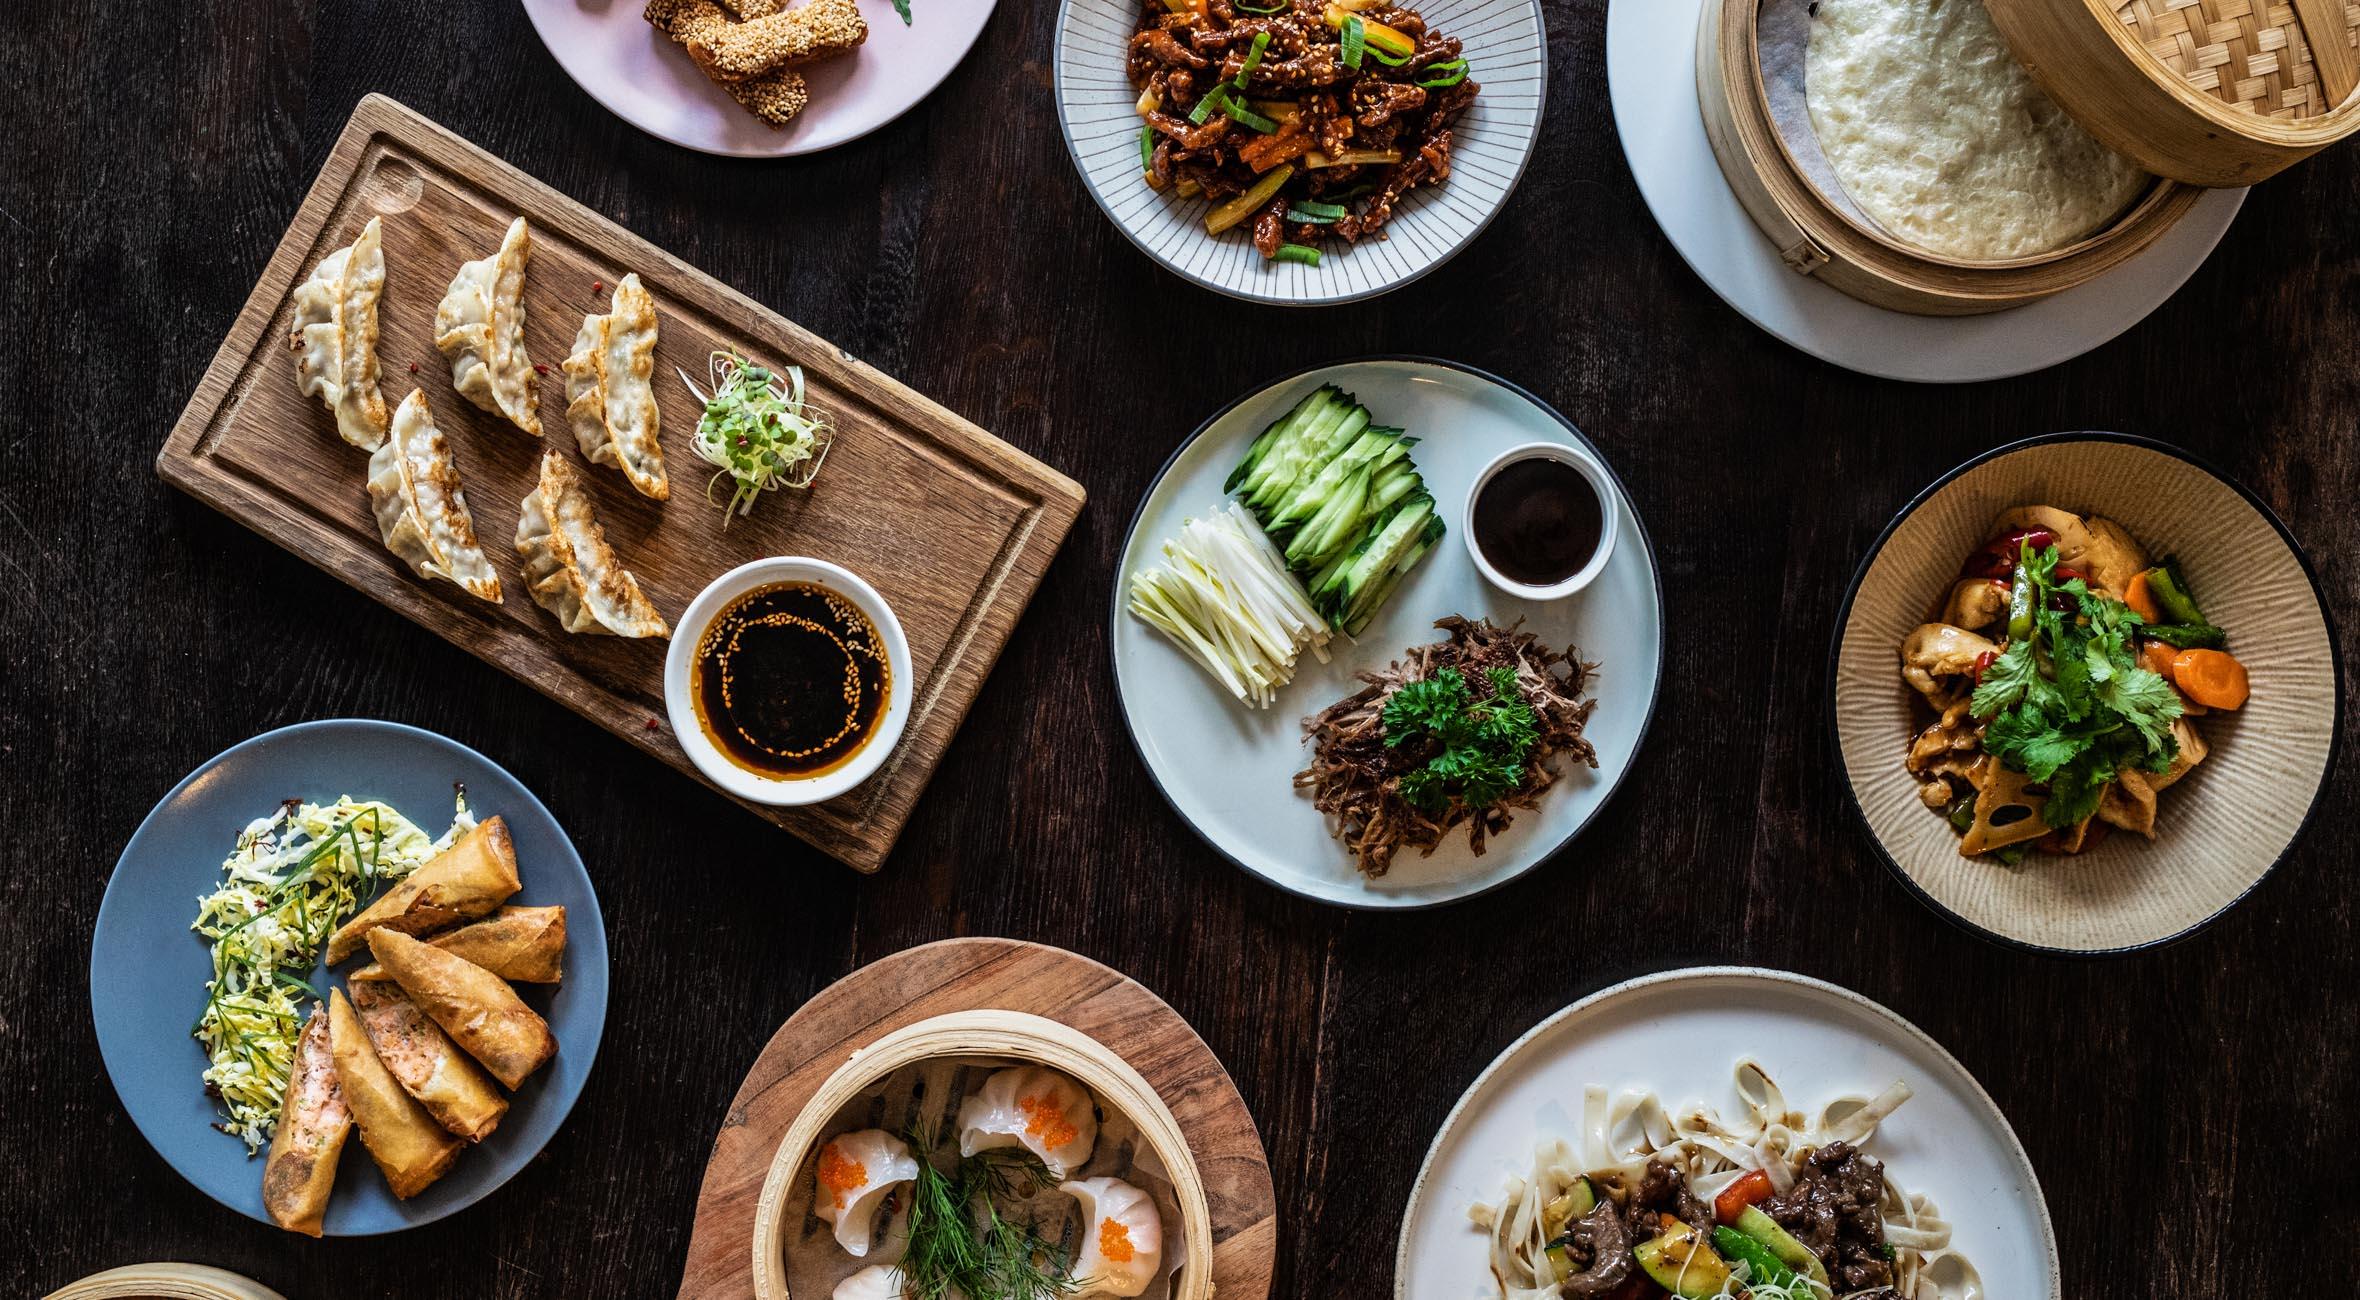 Frit valg til alt hos H Table i Indre By – Hypet kineser-restaurant byder på alt fra peking-and og dumplings til bao, forårsruller og okse i sur-sød sauce